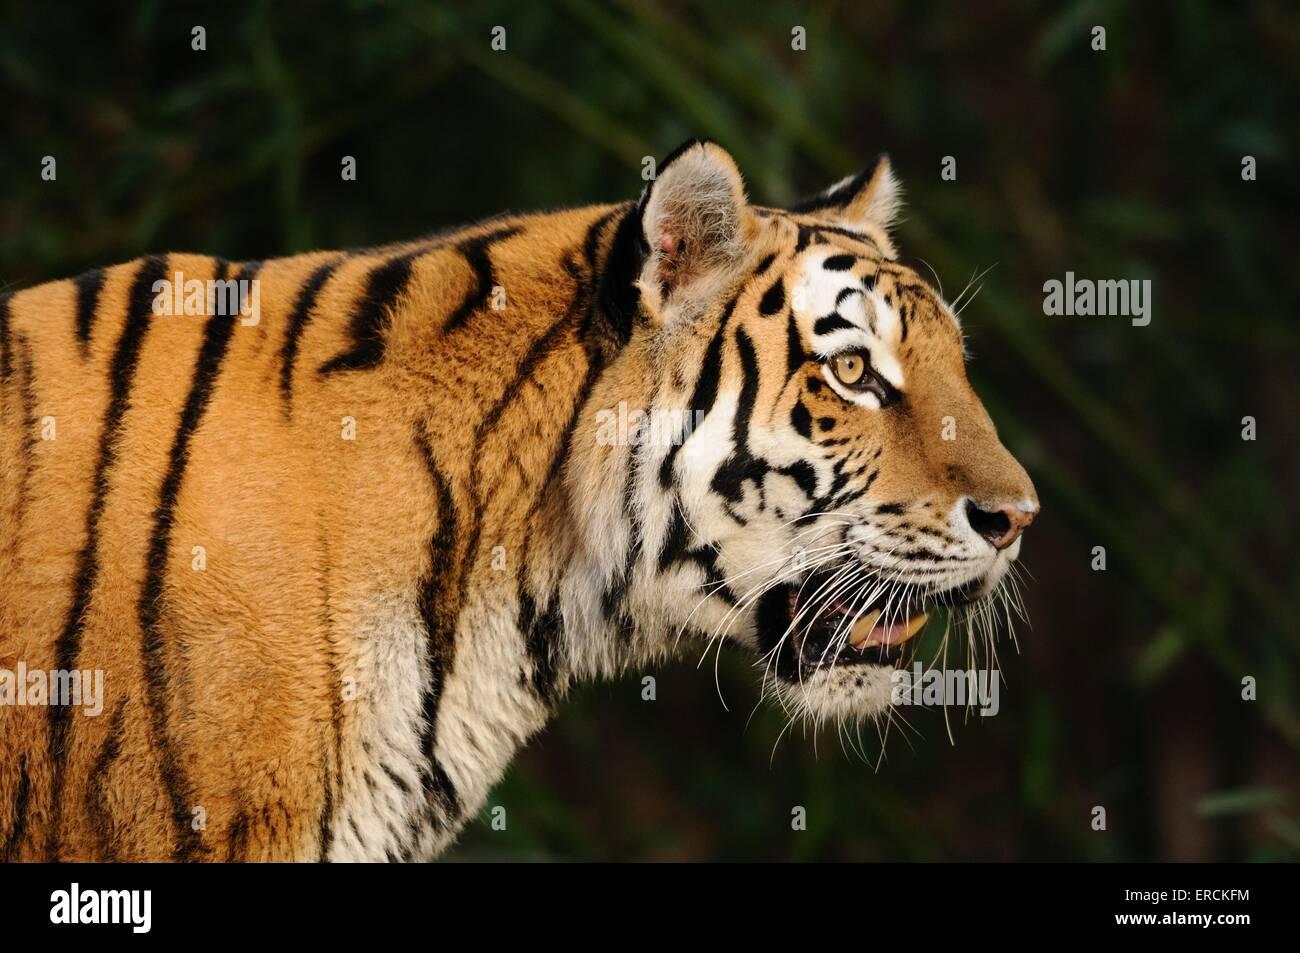 Tiger Portrait - Stock Image